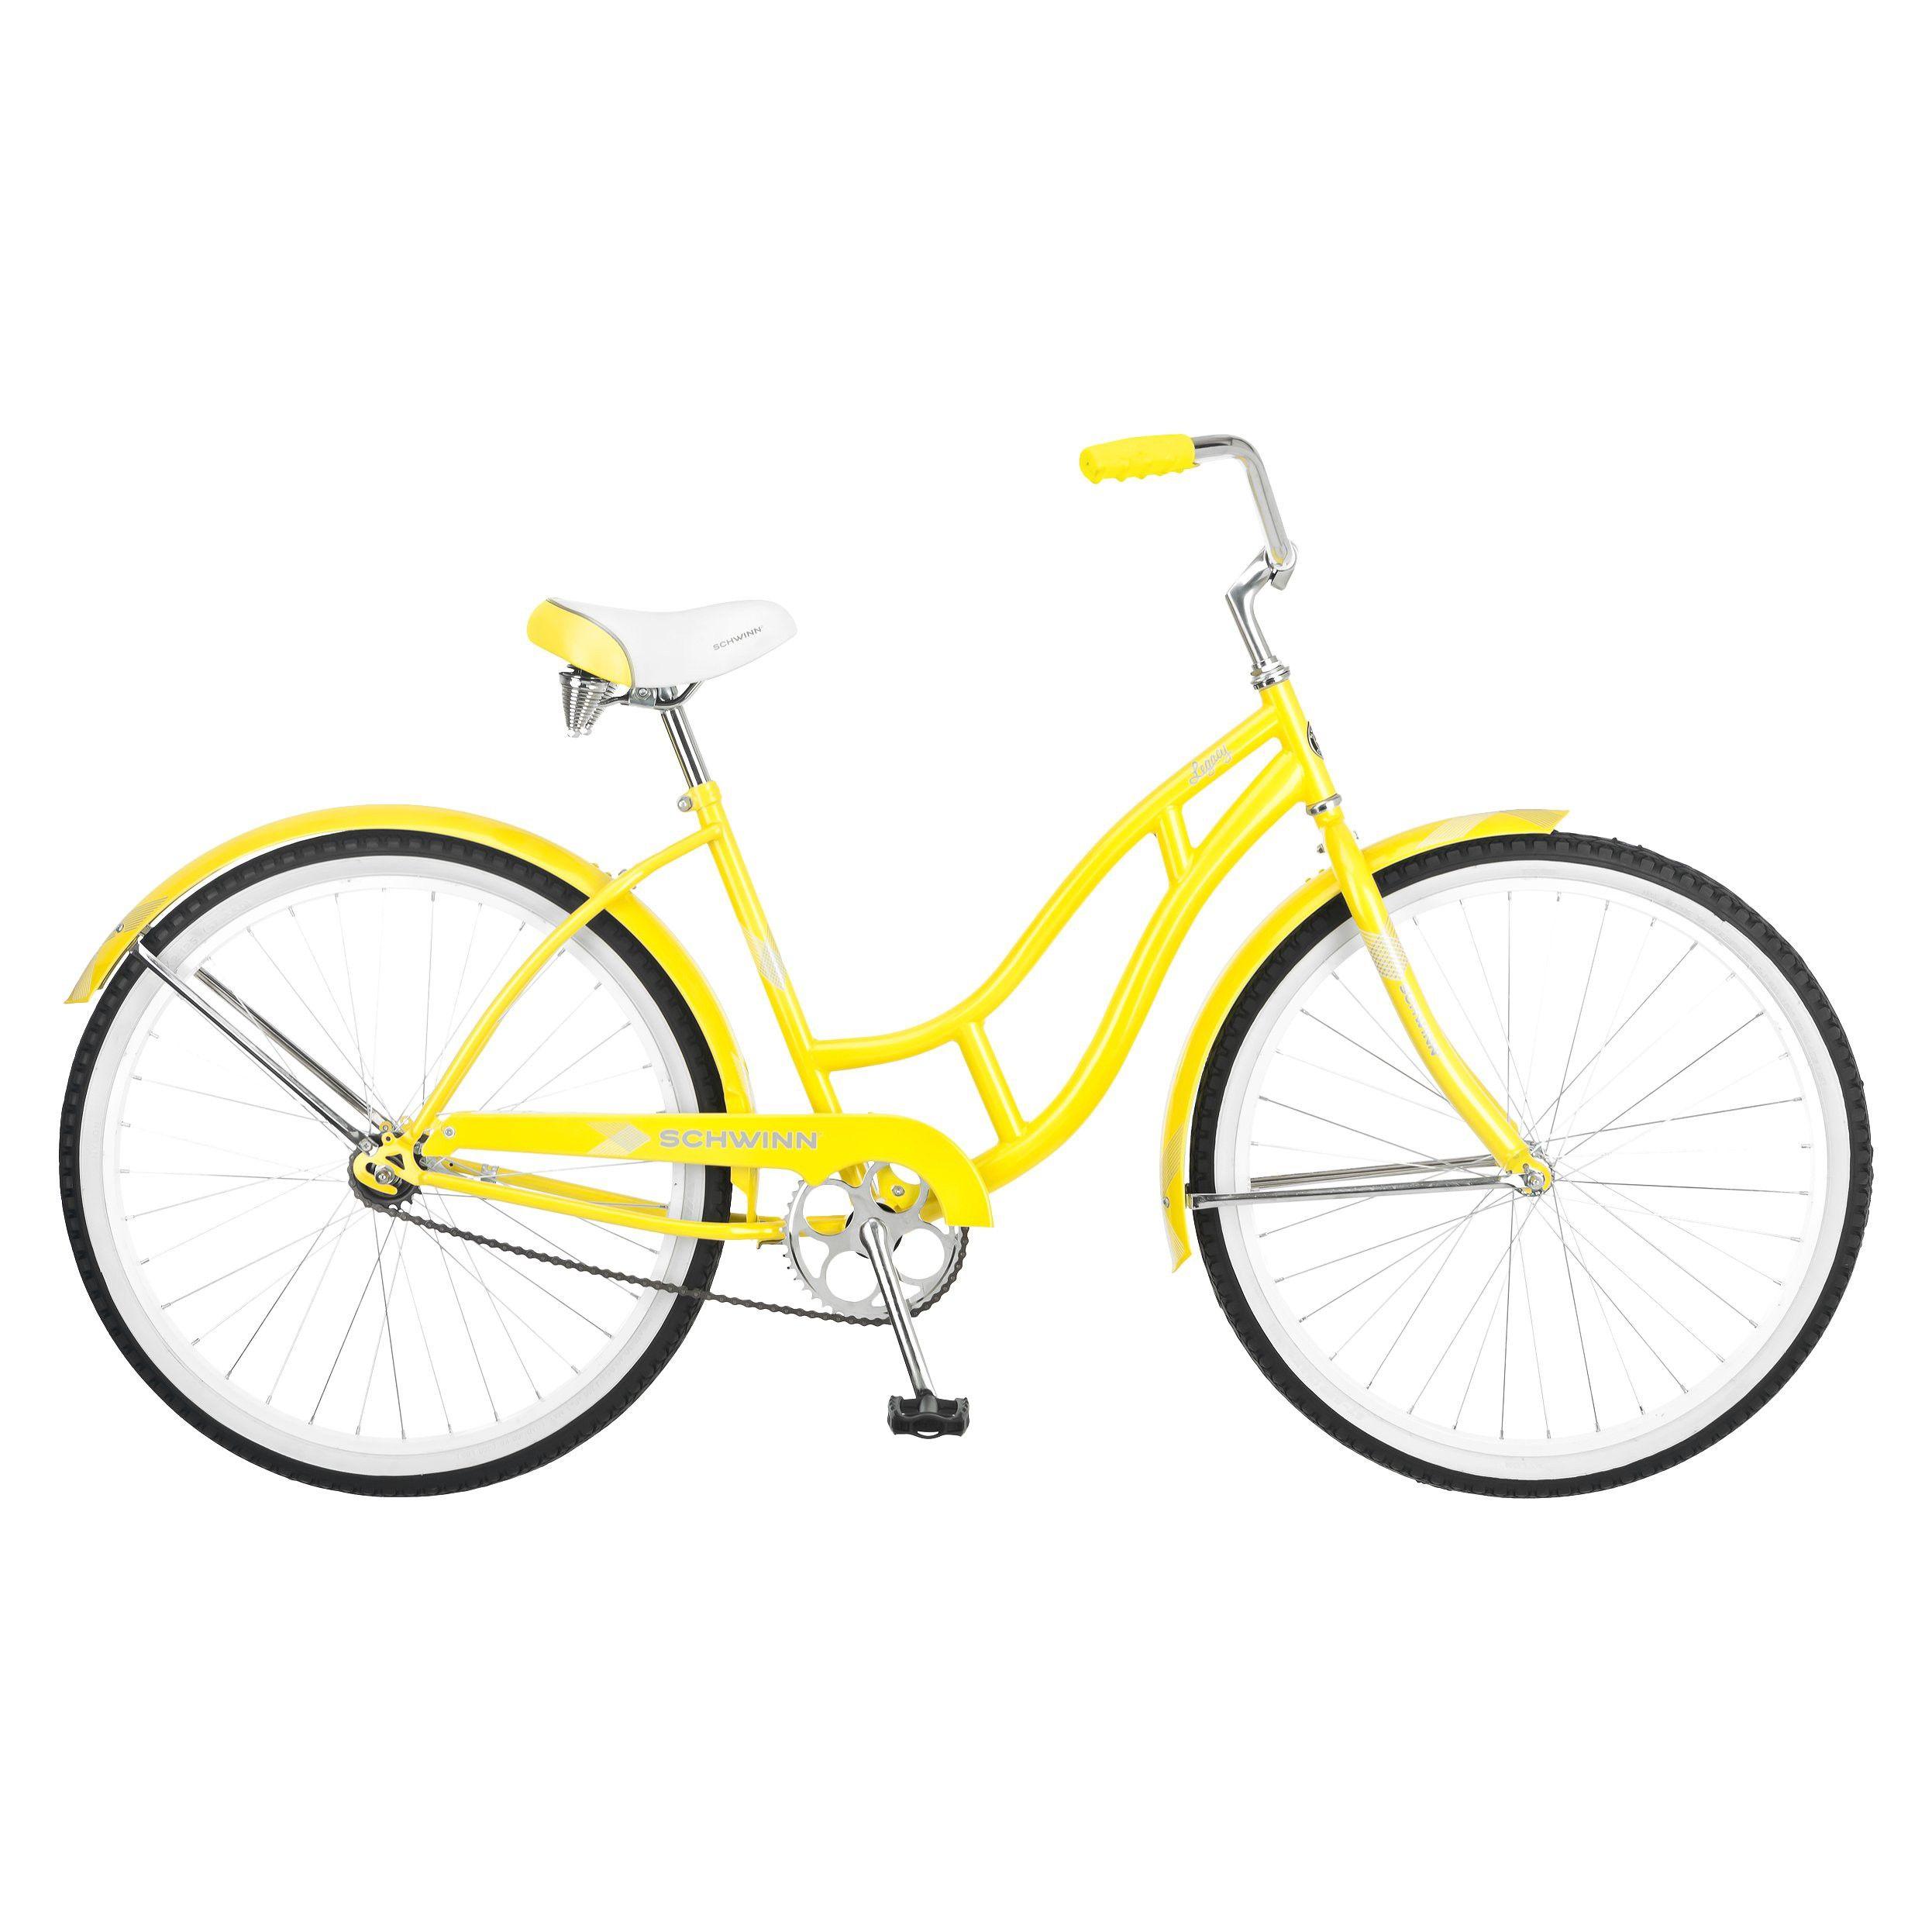 82364fad2af Schwinn Womens 26 L LEGACY YELLOW : Target   YELLOW   Bike, Bicycle ...